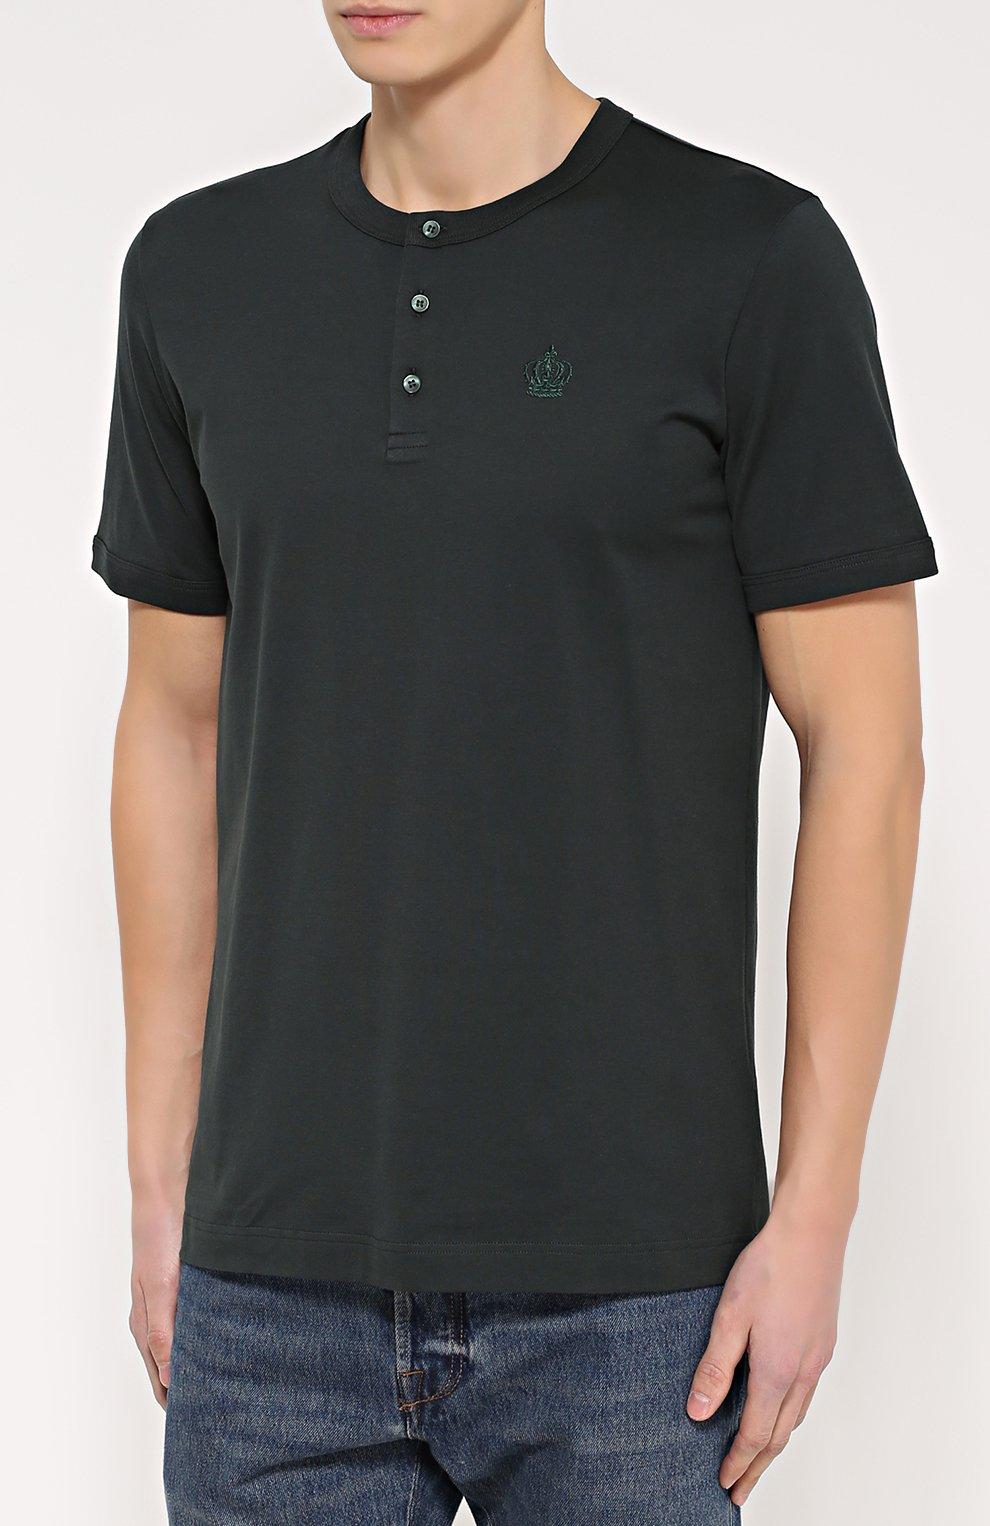 Хлопковая футболка хенли | Фото №3